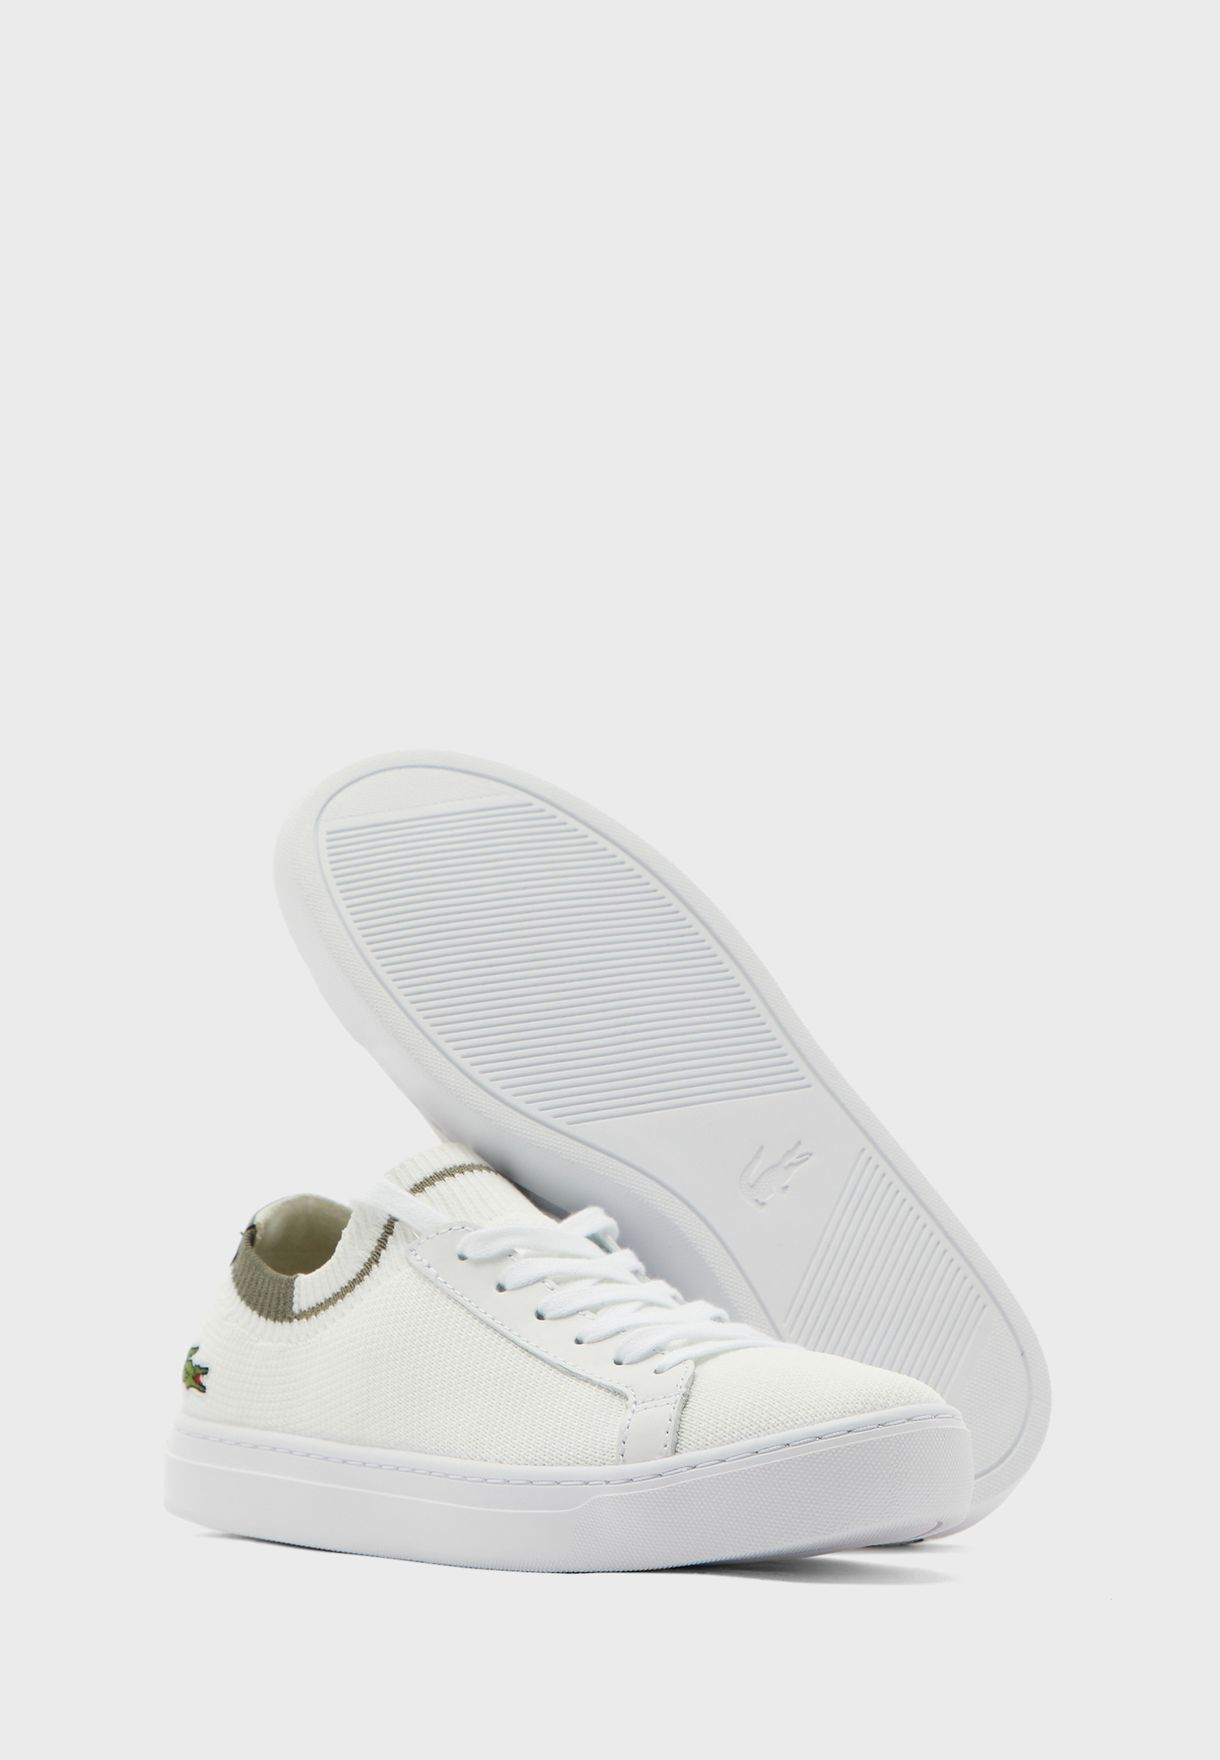 La Piquee Low Top Sneaker